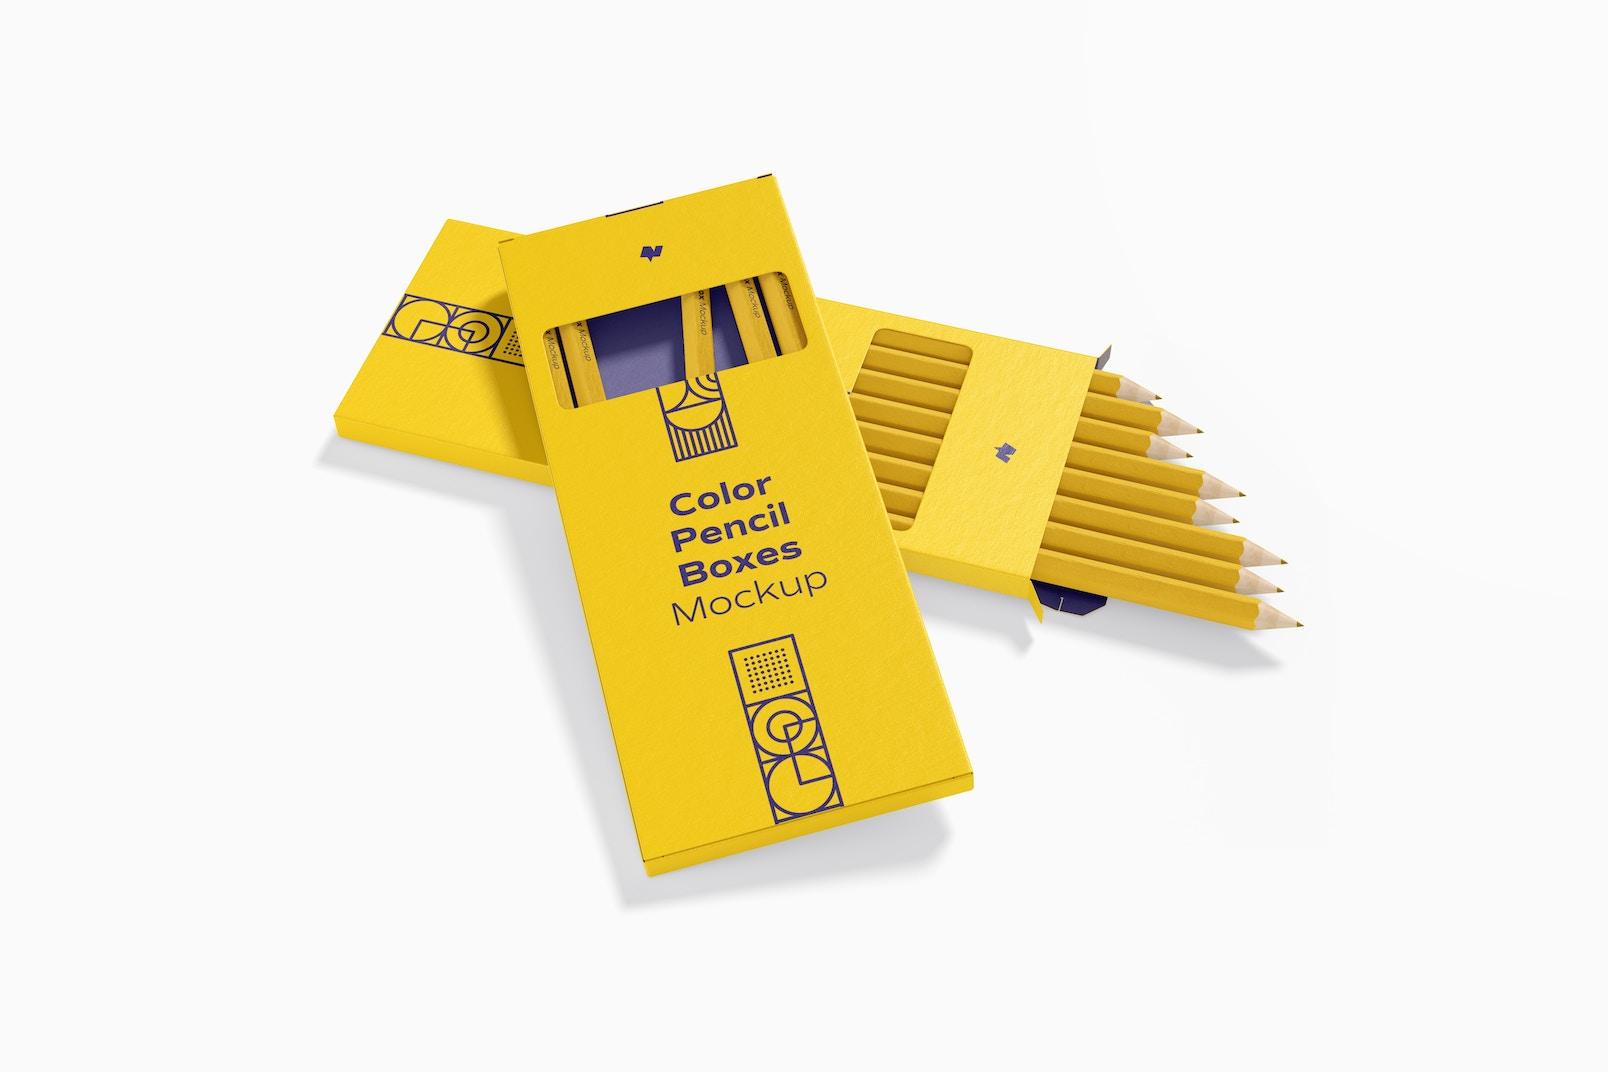 Color Pencil Boxes Mockup